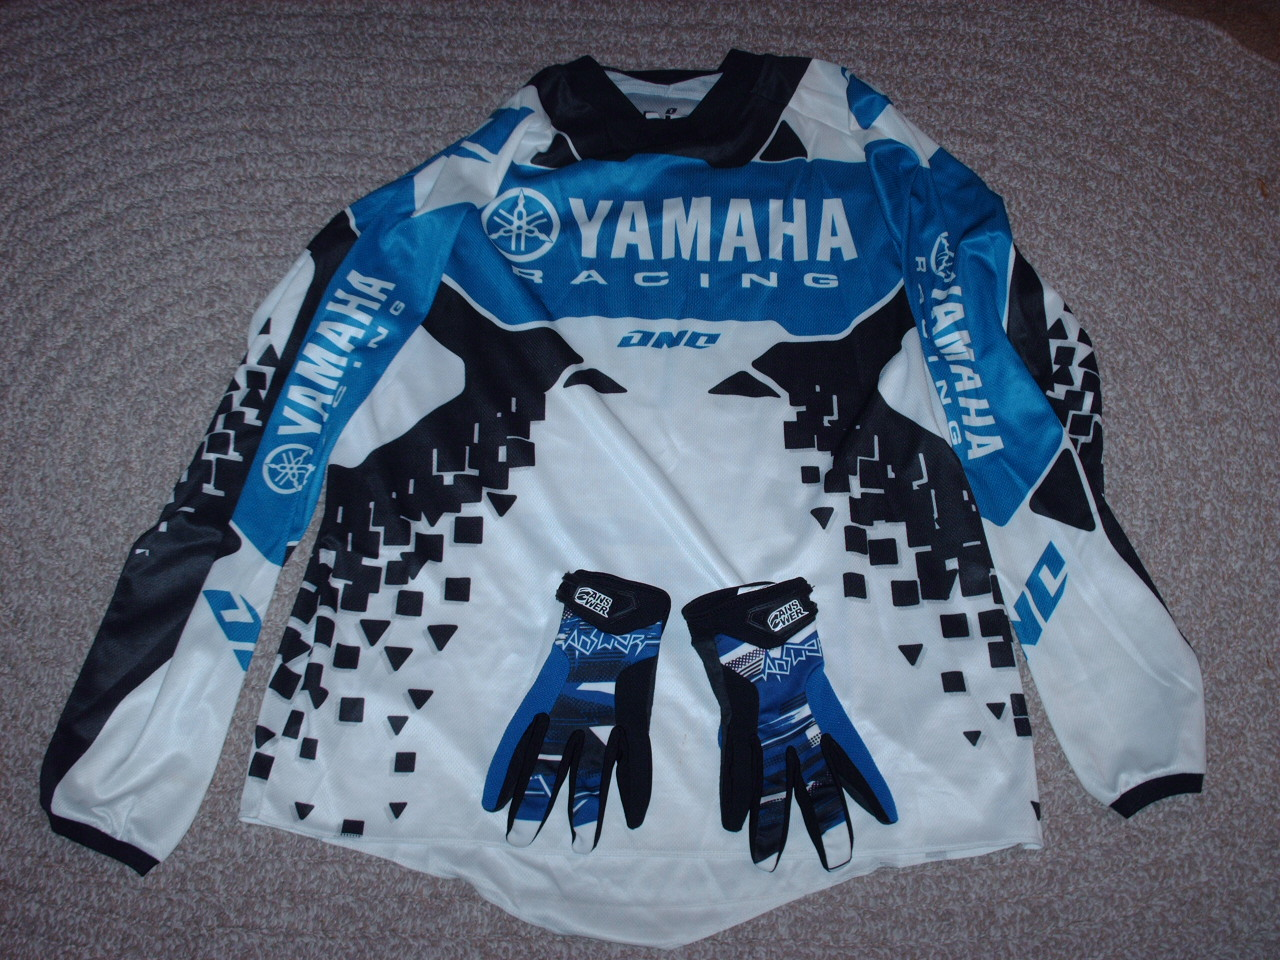 yamaha jersey. yamaha jersey and gloves 001.